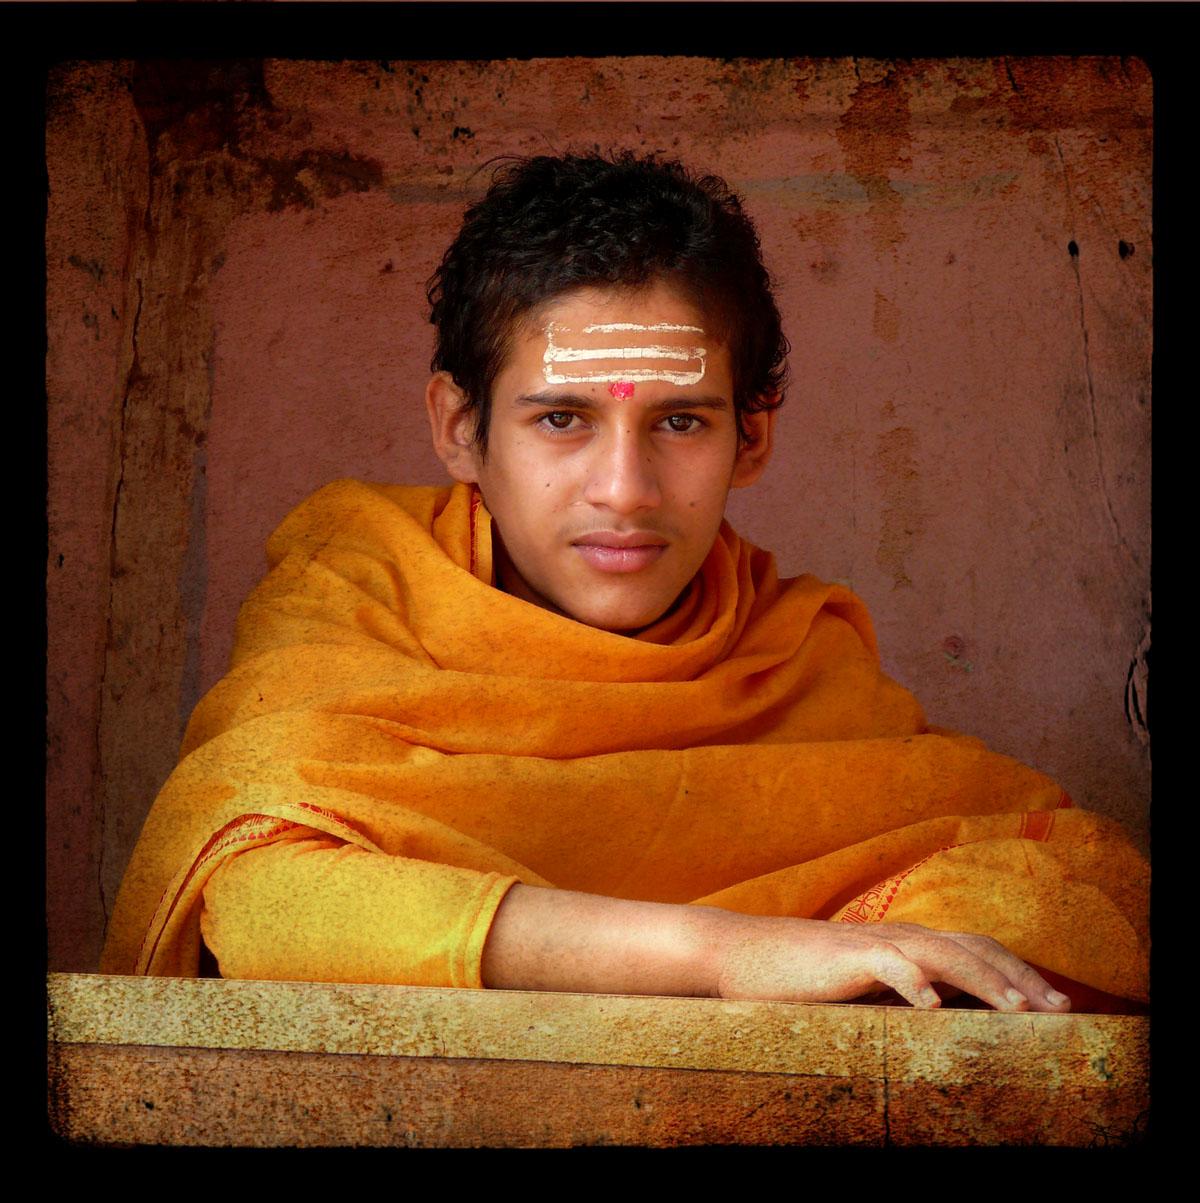 The concept of caste across indian communities